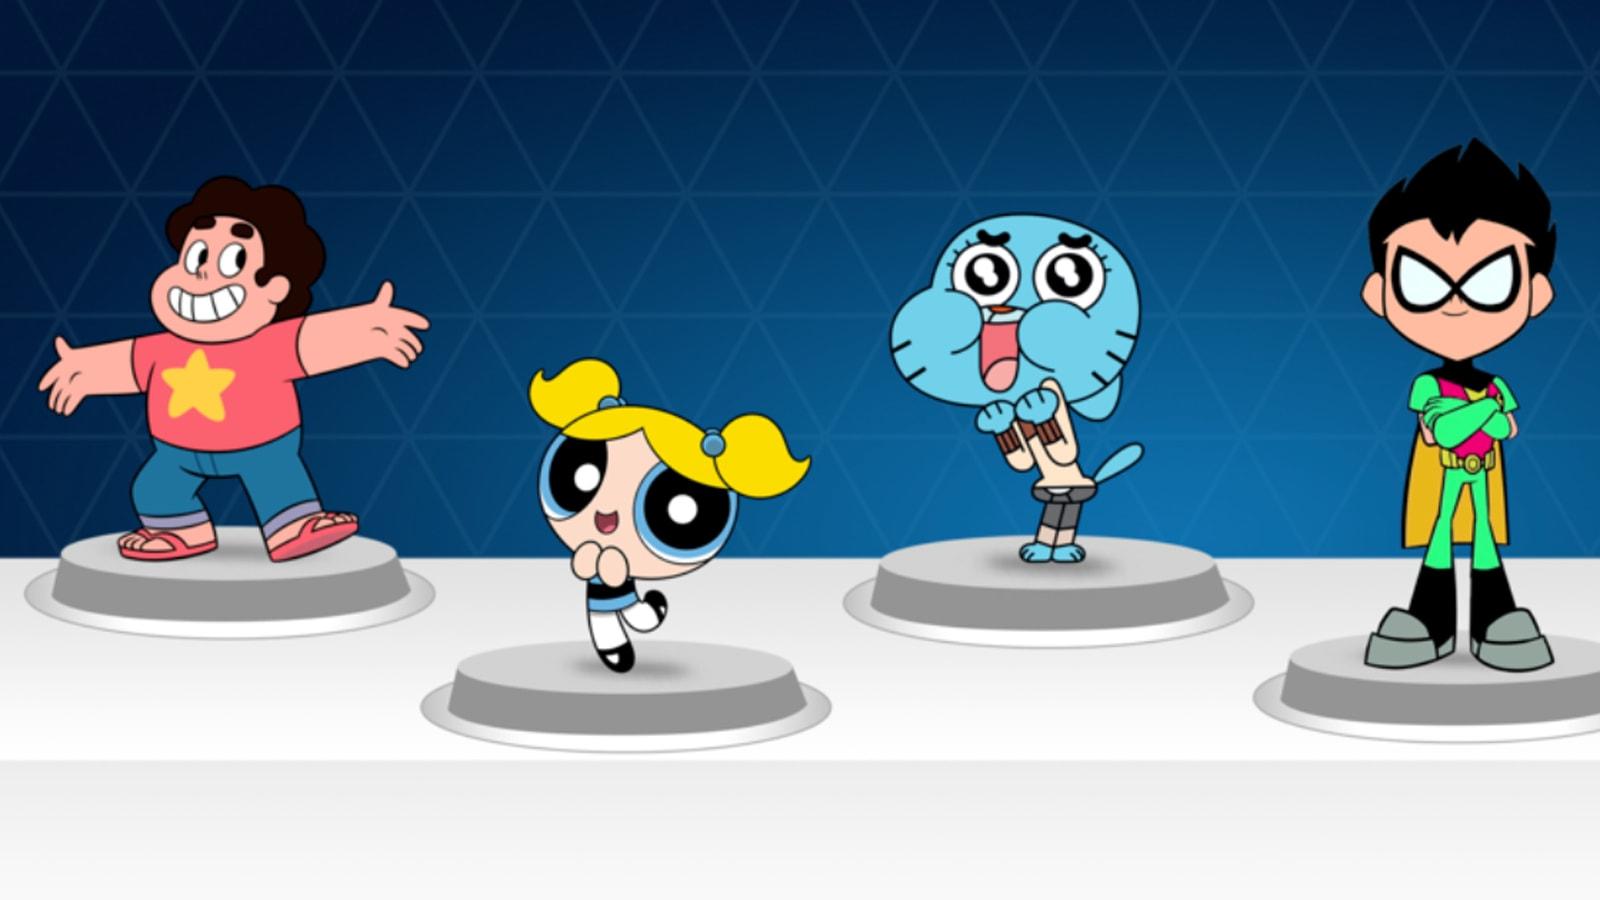 Cartoon Network app 'rewards' TV viewing with virtual